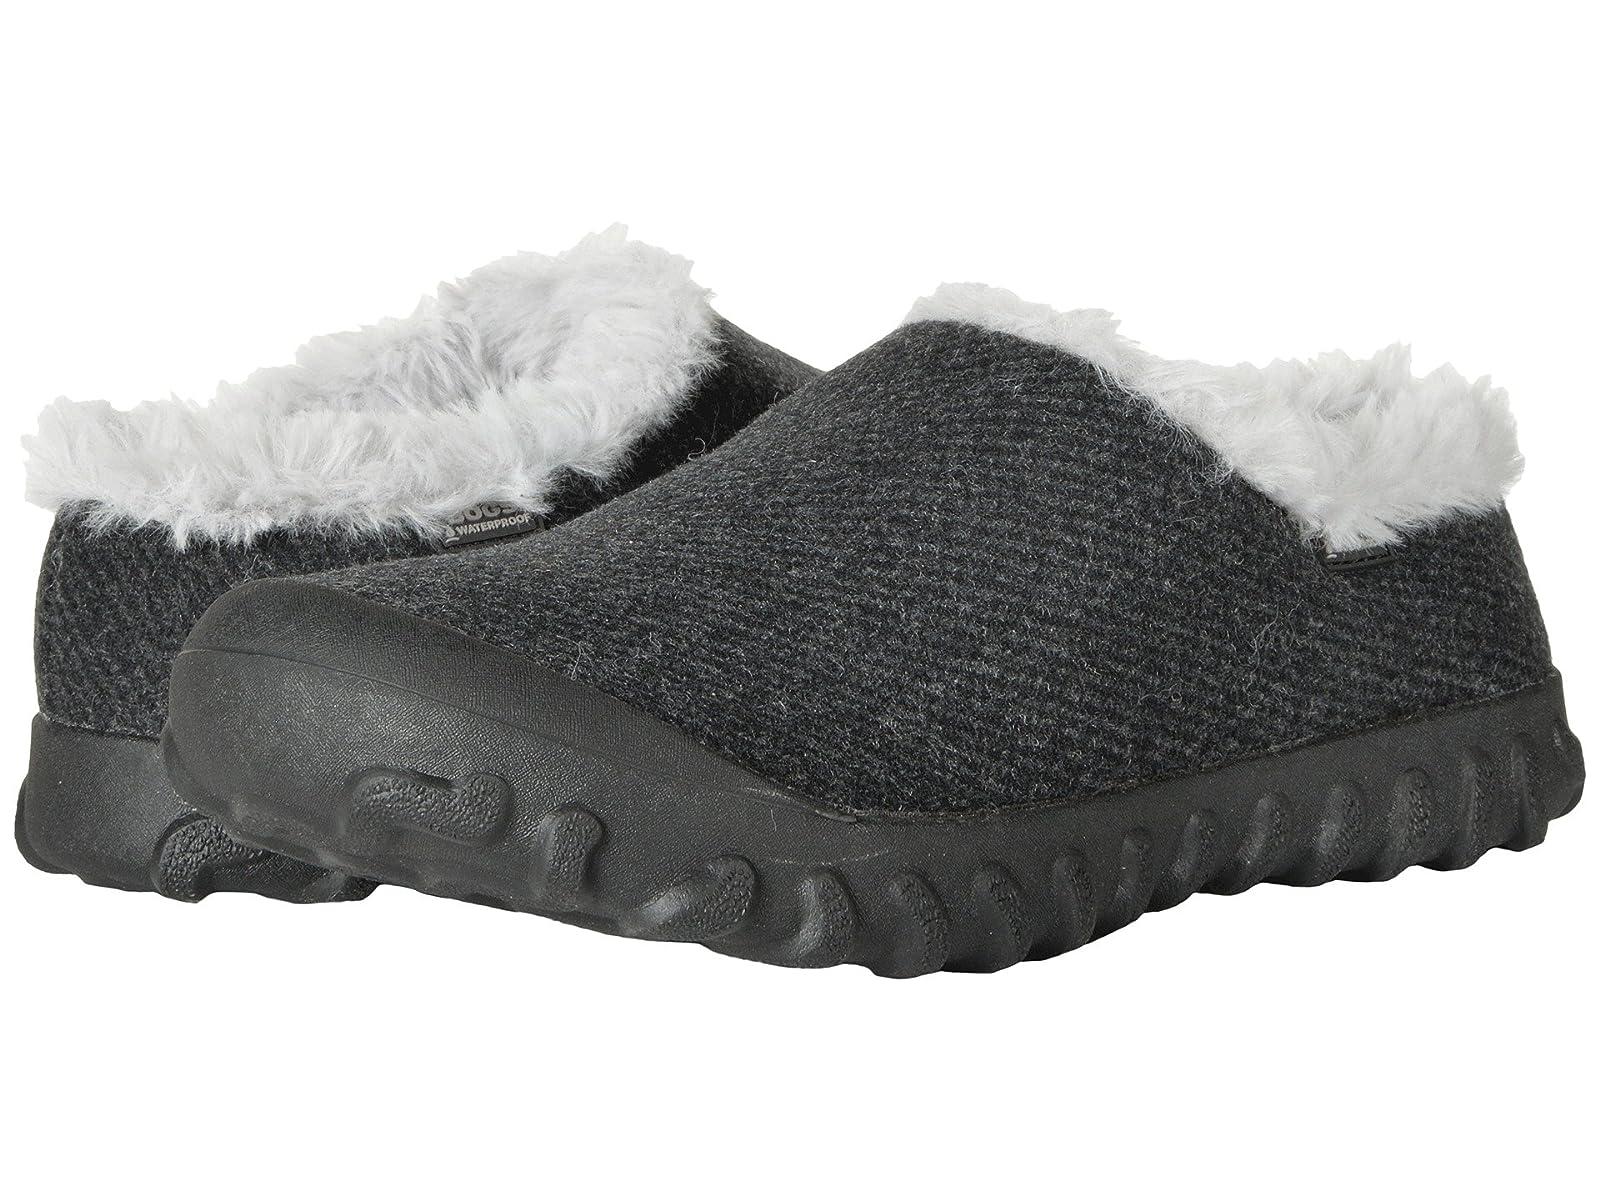 Bogs B-Moc Slip-On WoolAtmospheric grades have affordable shoes